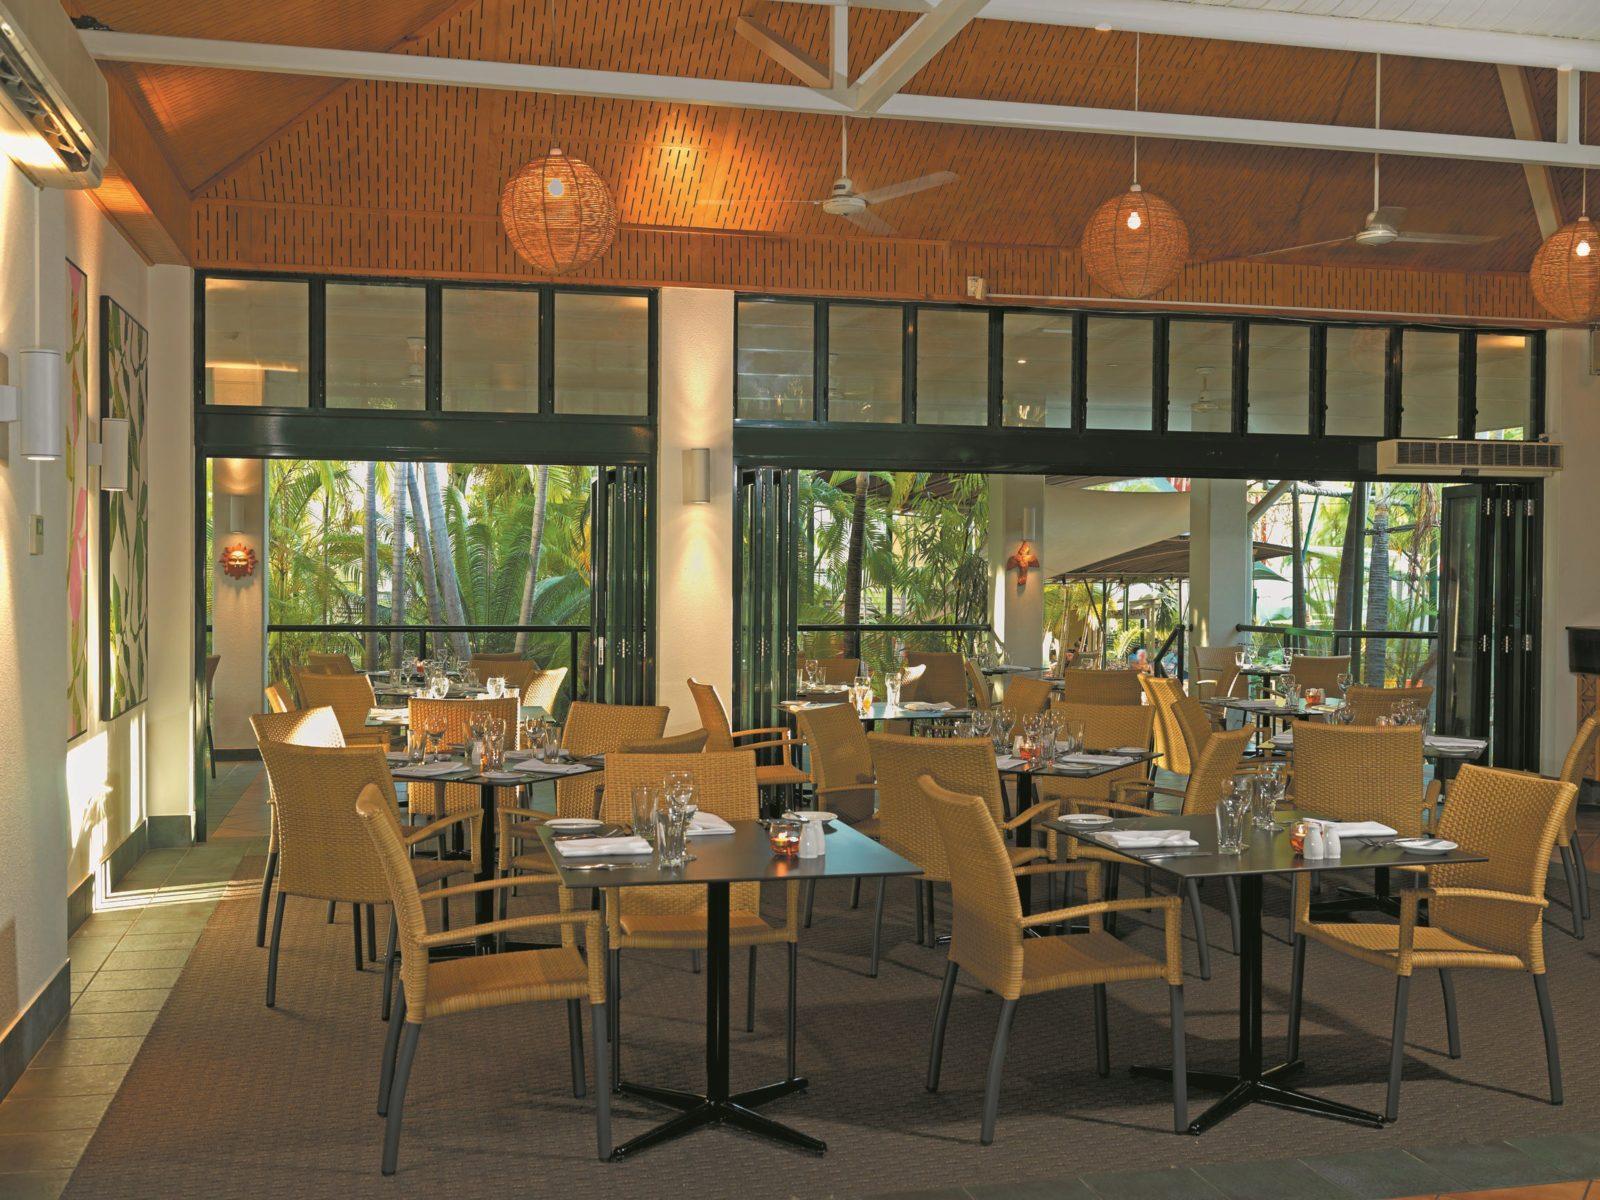 Treetops Restaurant, Darwin Area, Northern Territory, Australia